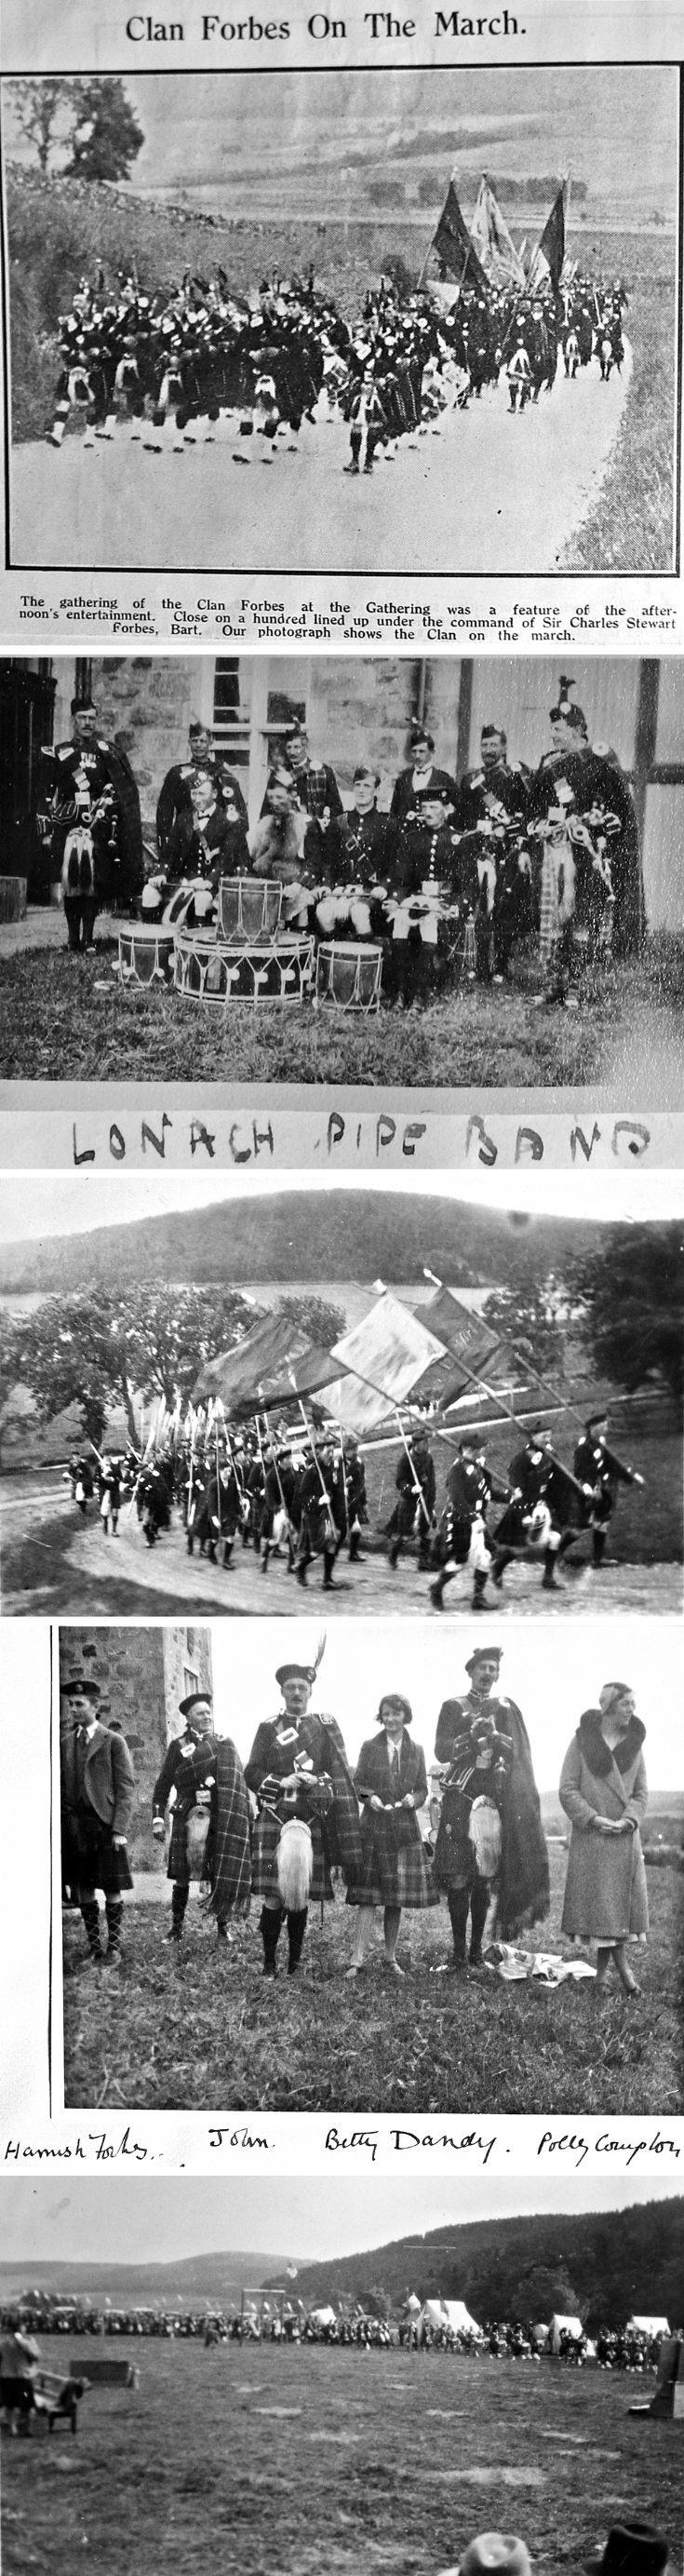 29 Lonach Gathering c 1930